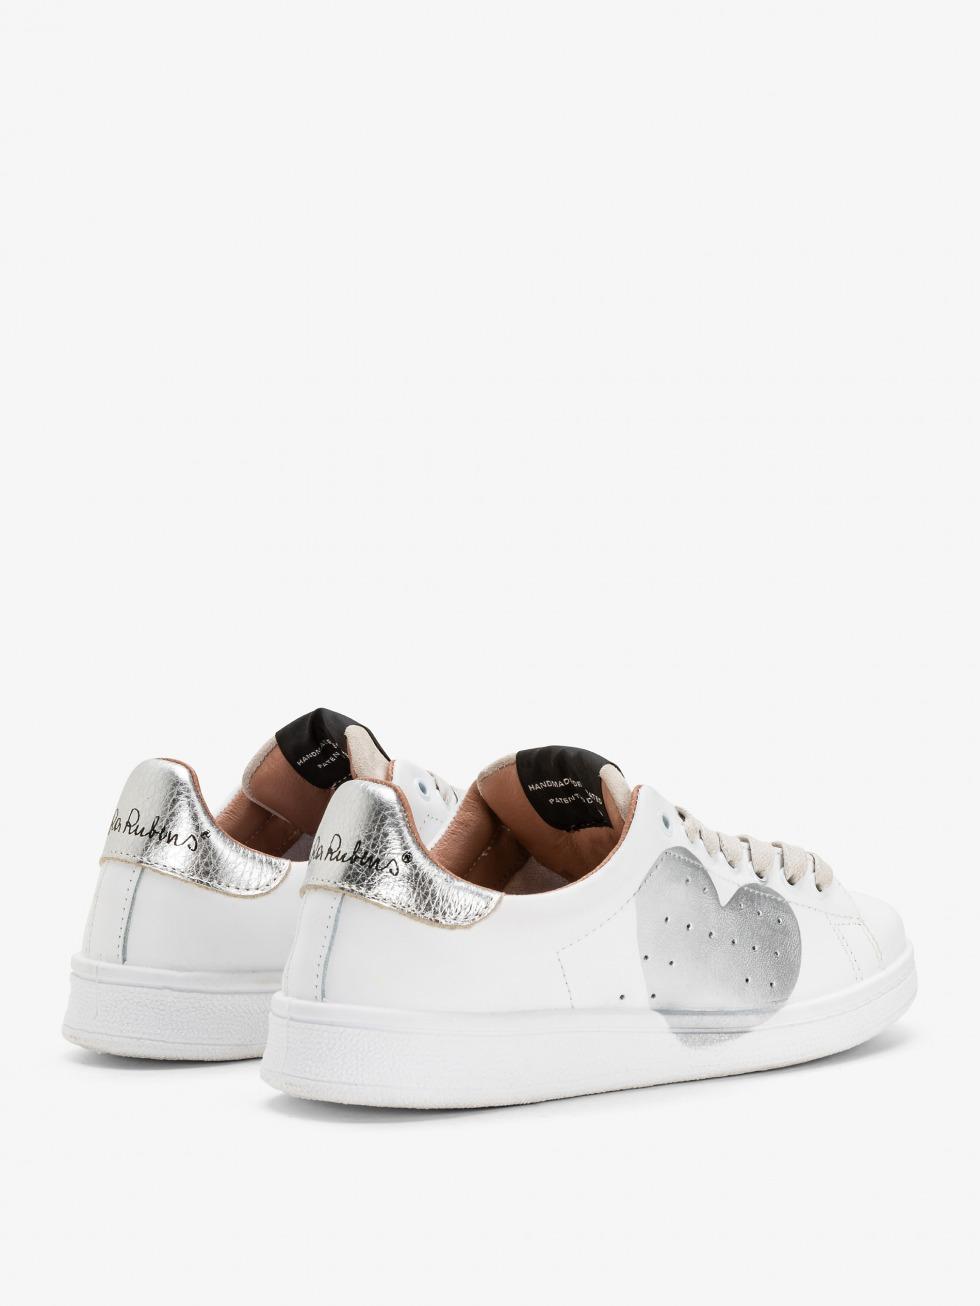 Daiquiri Sneakers - Moon Silver Heart